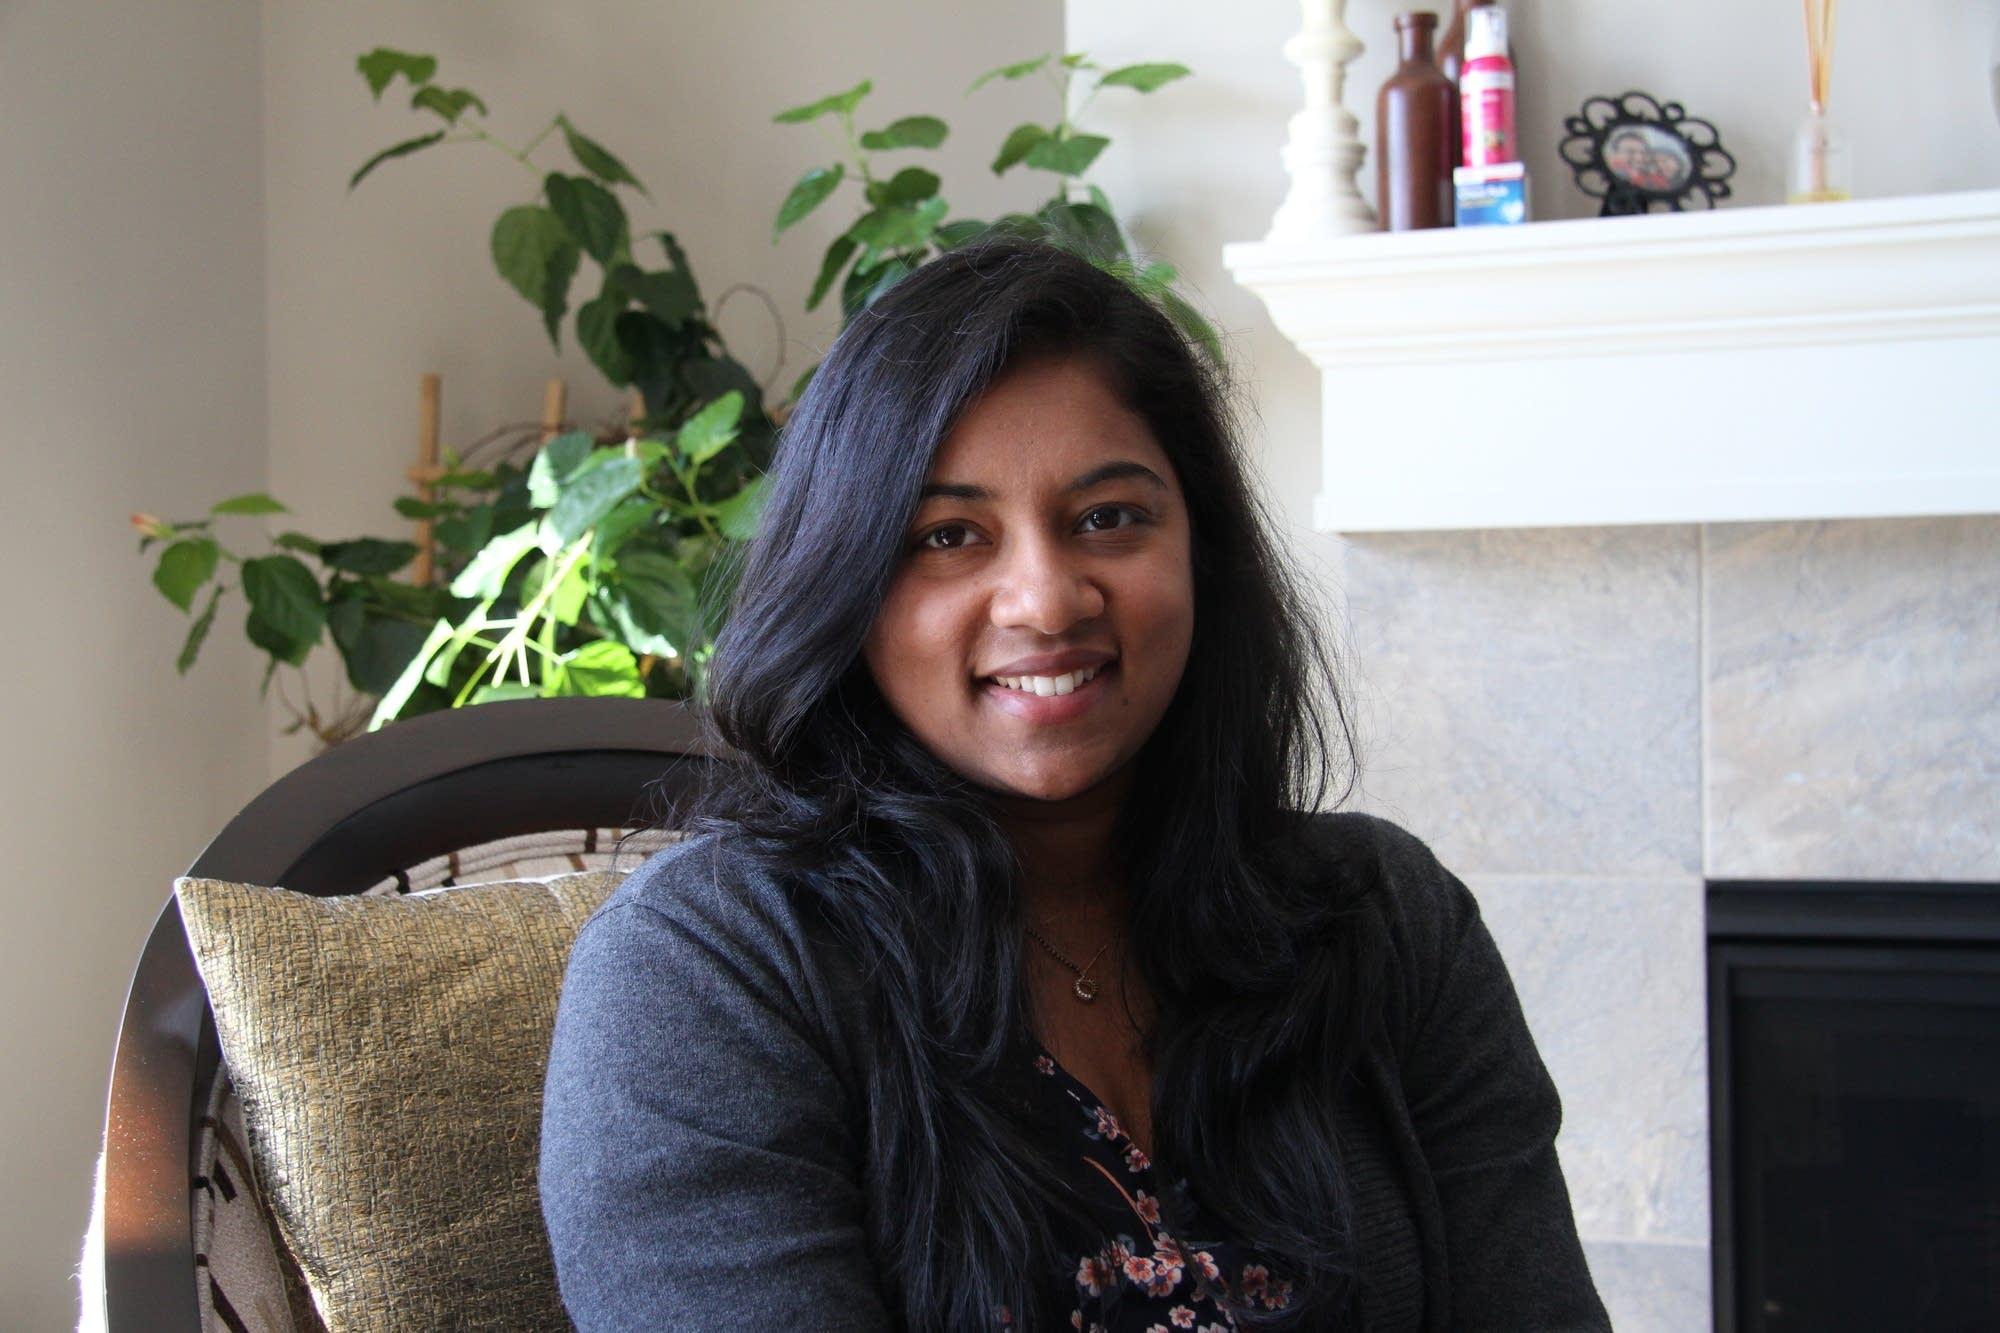 Vanashree Belgamwar, 29, is immigrant from India.